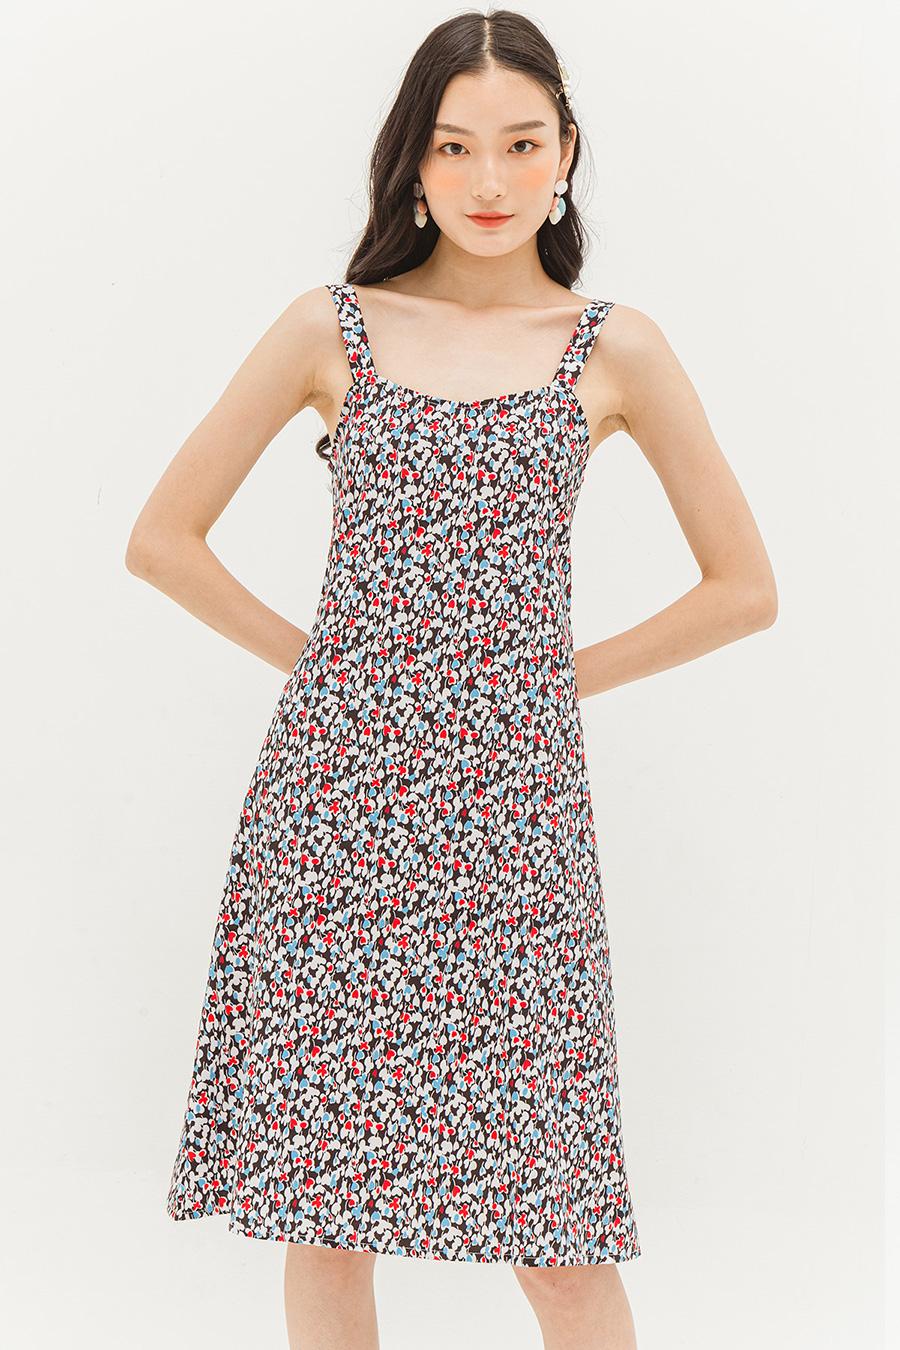 CAROLINA DRESS - FUSCHIA